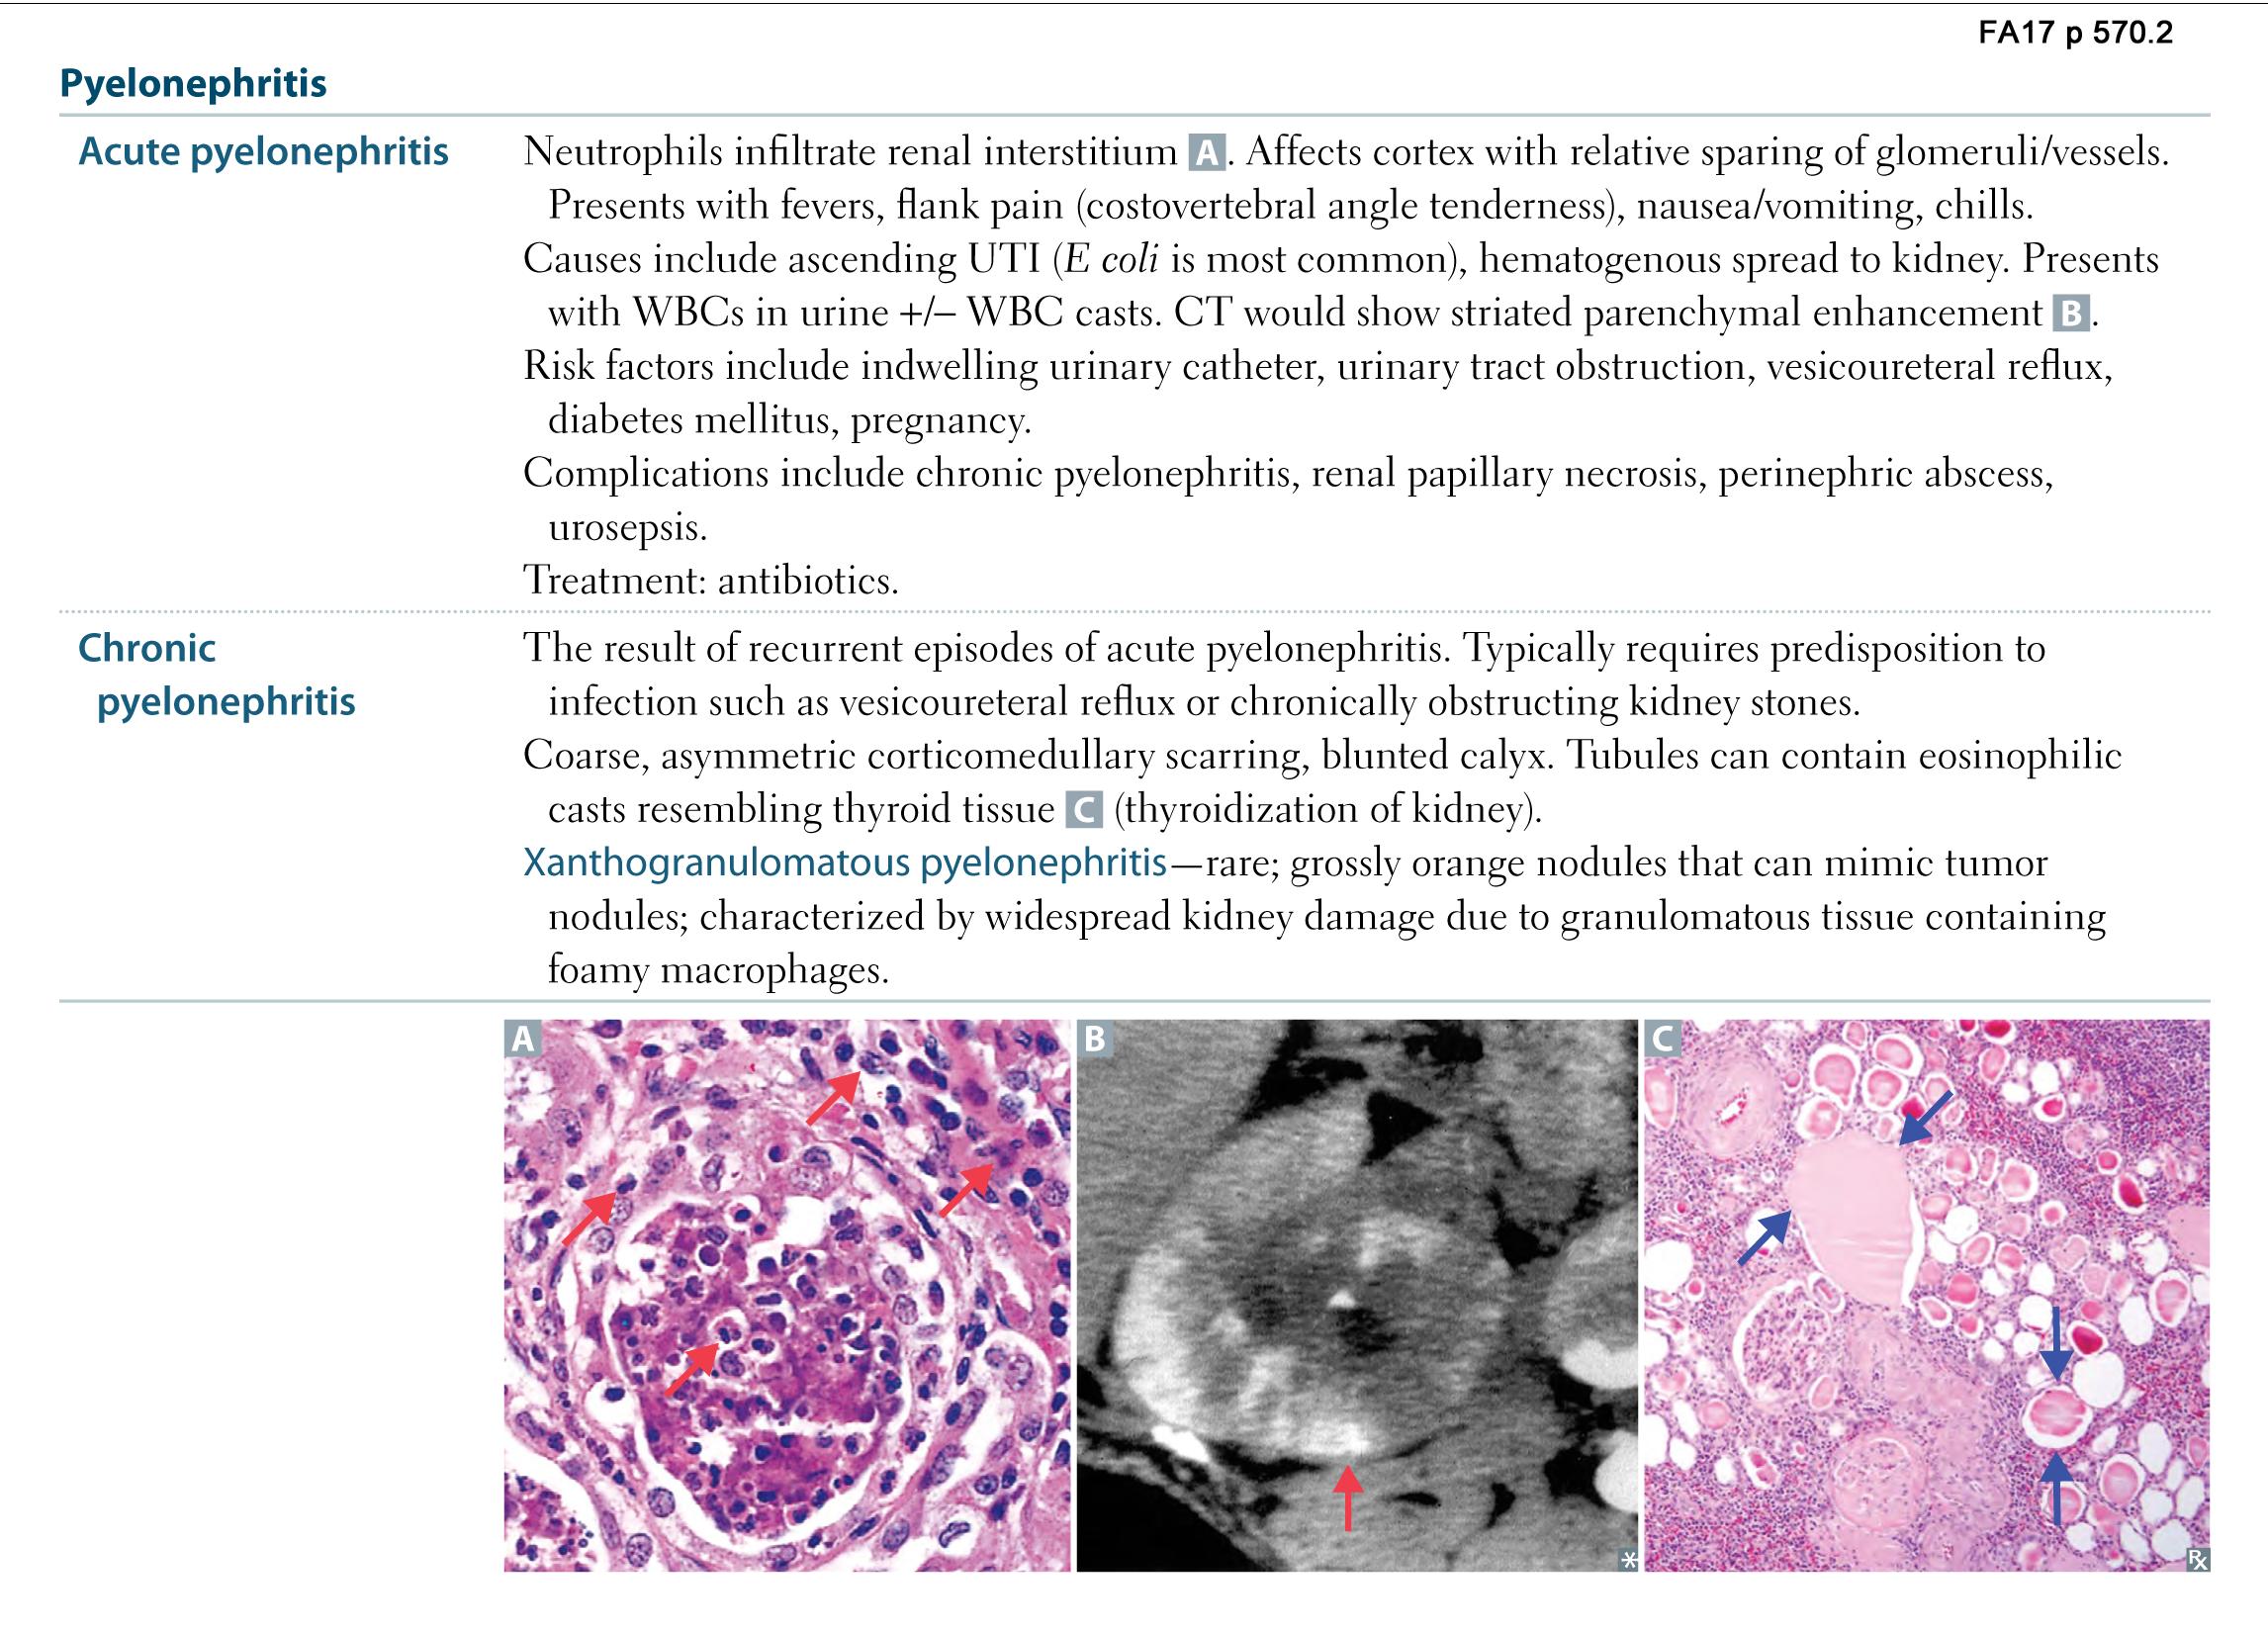 What is pyelonephritis